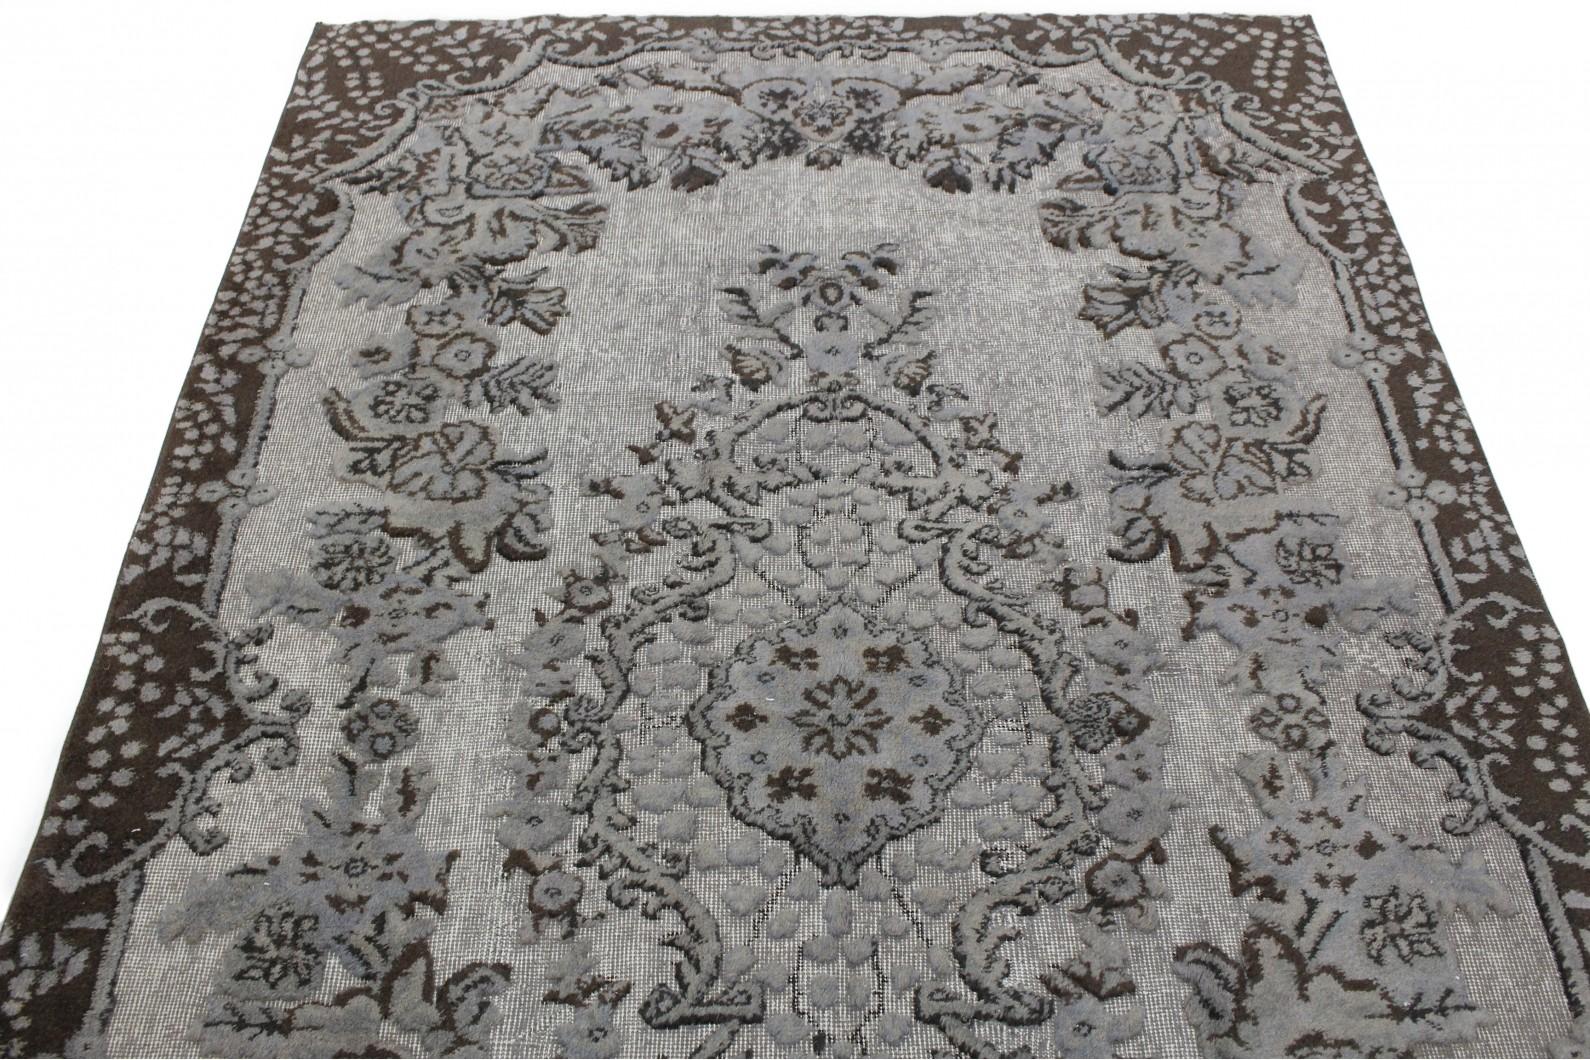 ... Vintage Teppich 3D Look Grau In 270x170 (2/4) ...